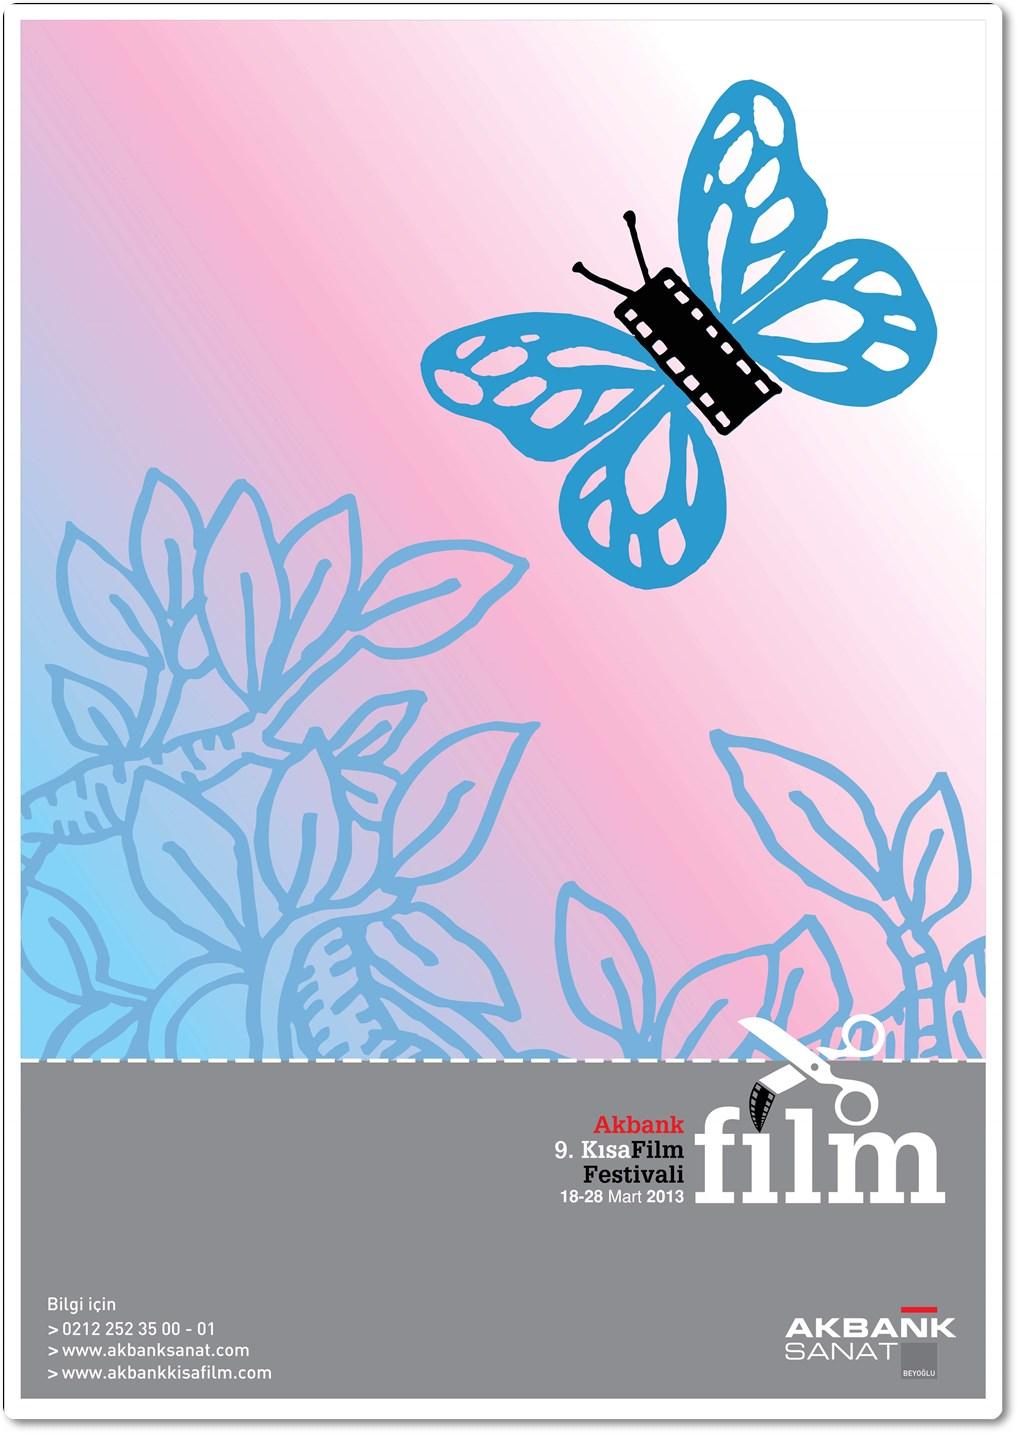 Akbank 9 kısa film festivali 1